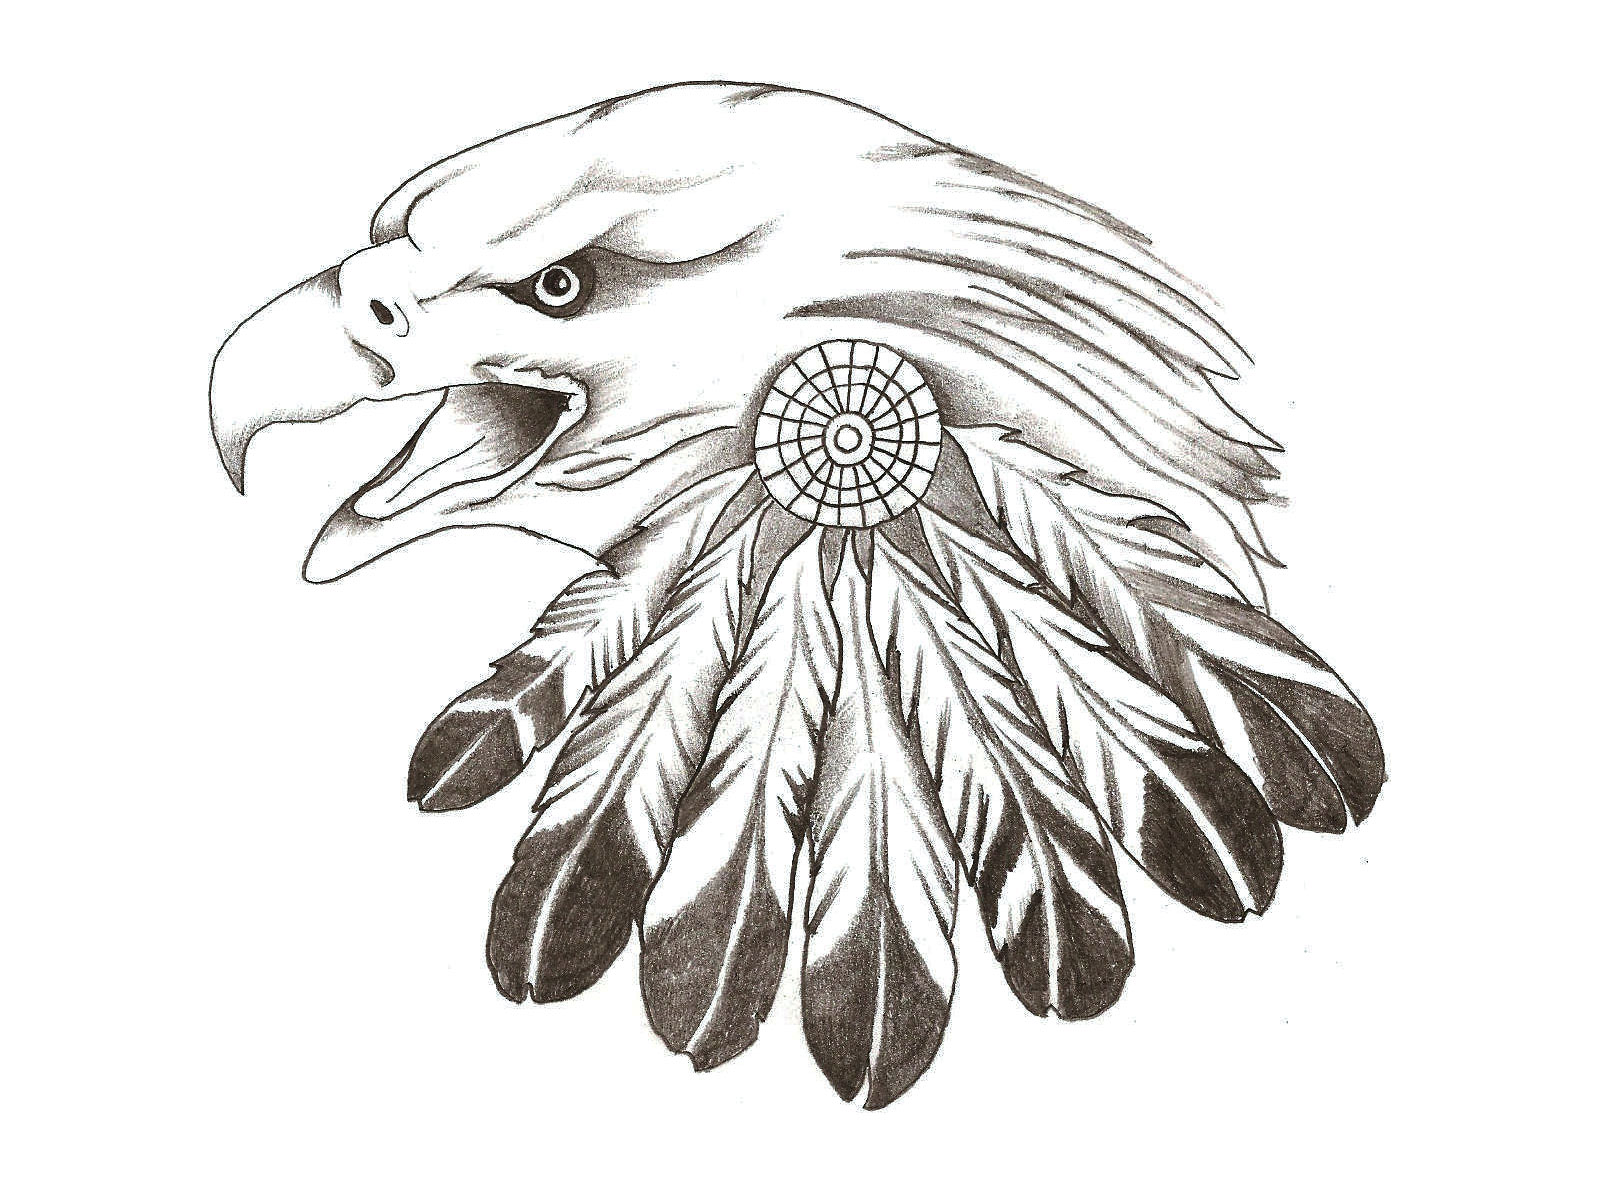 14 Cool Eagle Designs Images